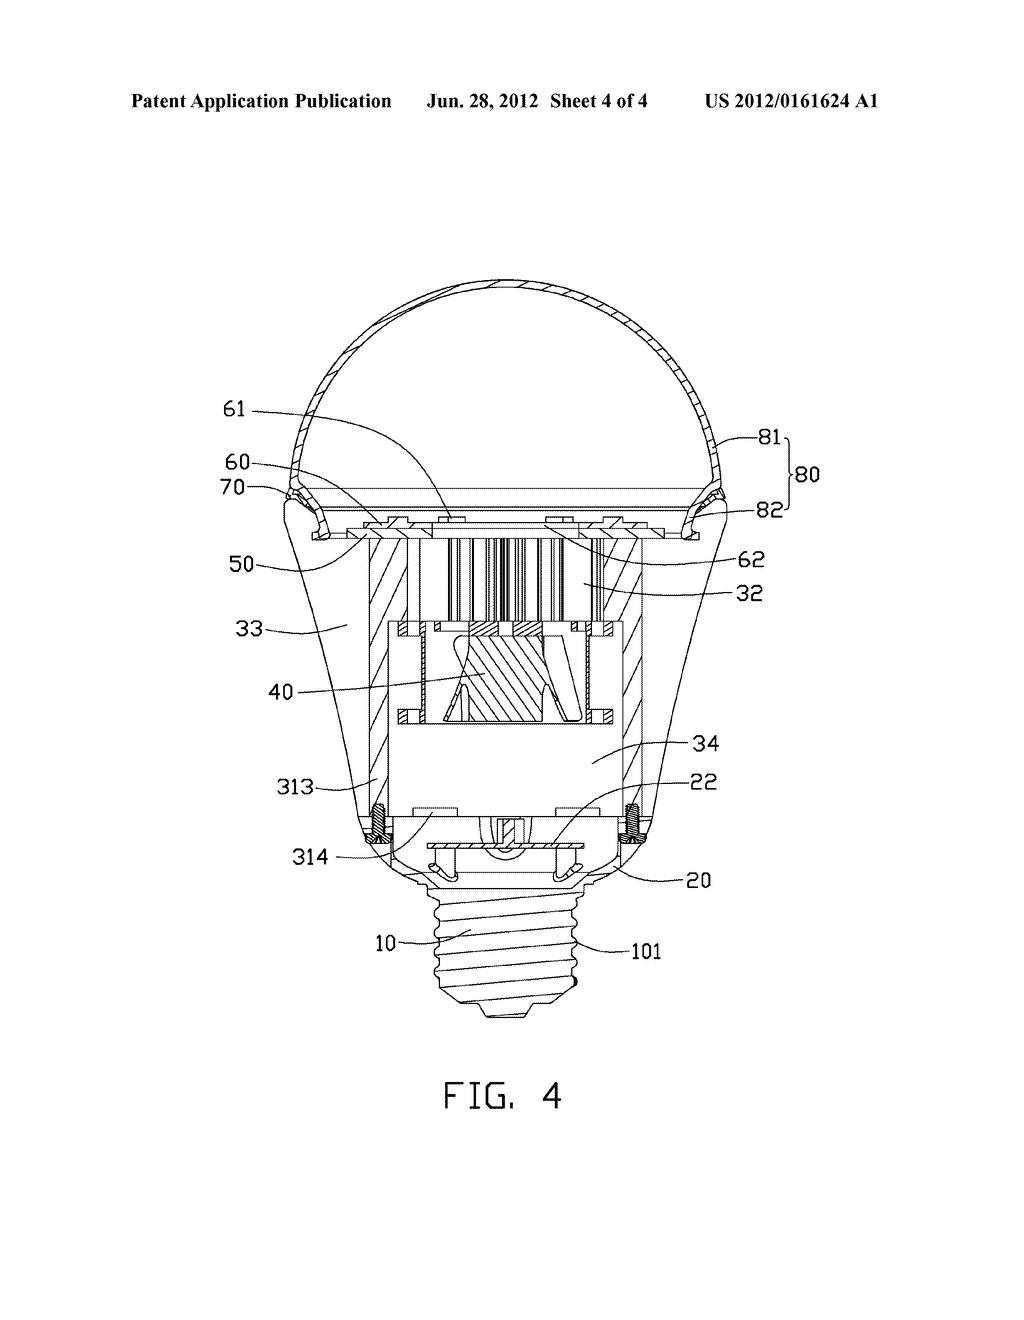 hight resolution of led bulb diagram wiring diagram schematics ryobi led light parts diagram led bulb diagram schematic wiring